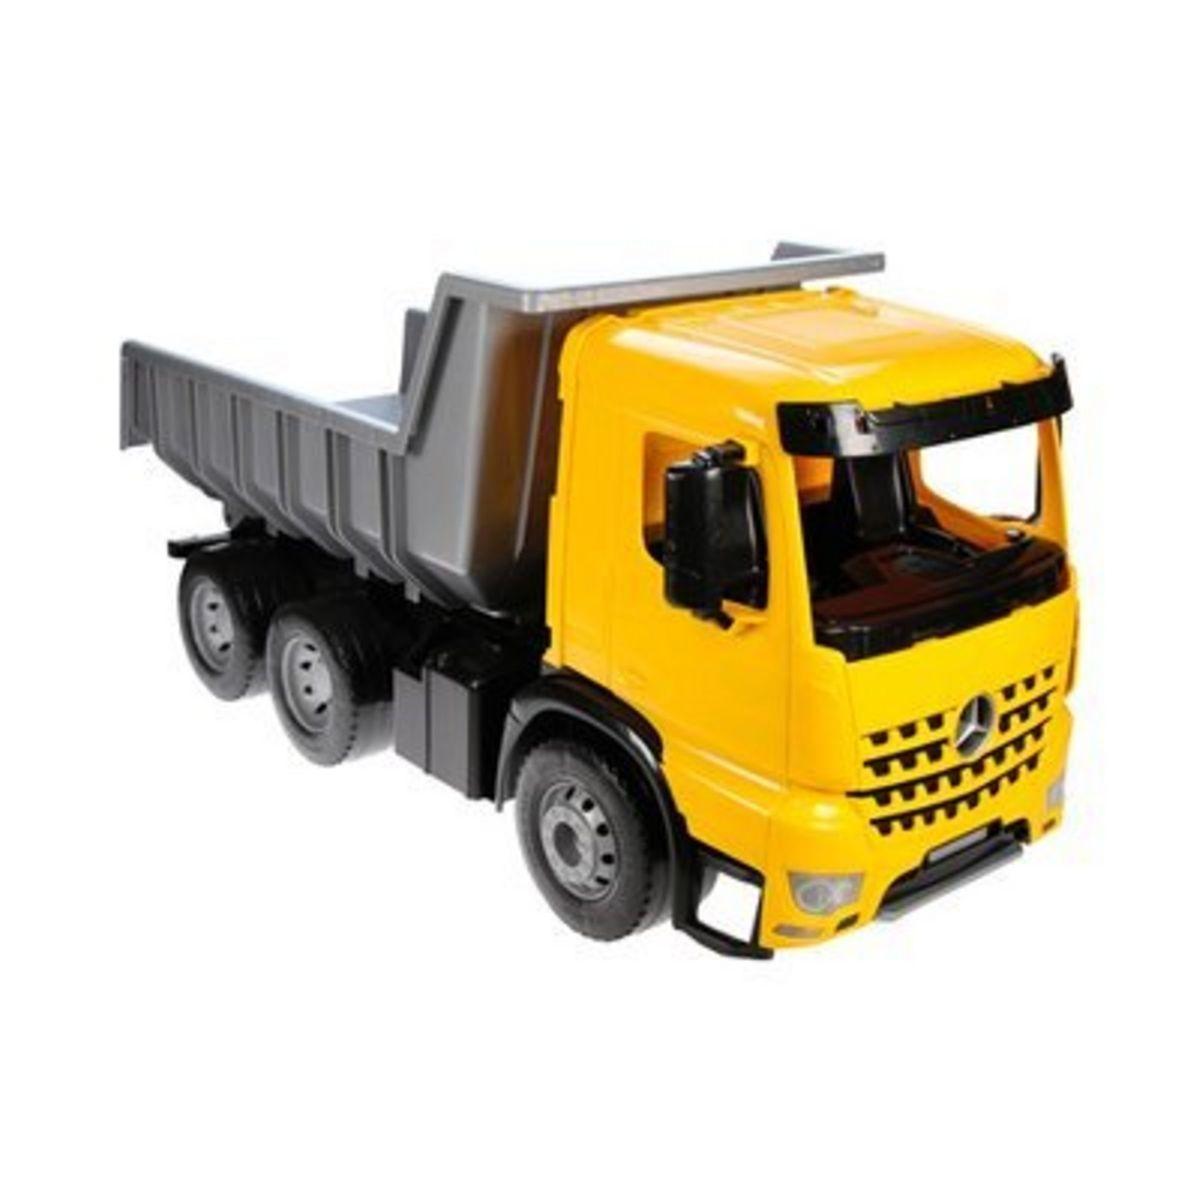 LENA Le camion-benne XXL Mercedes Arocs véhicule